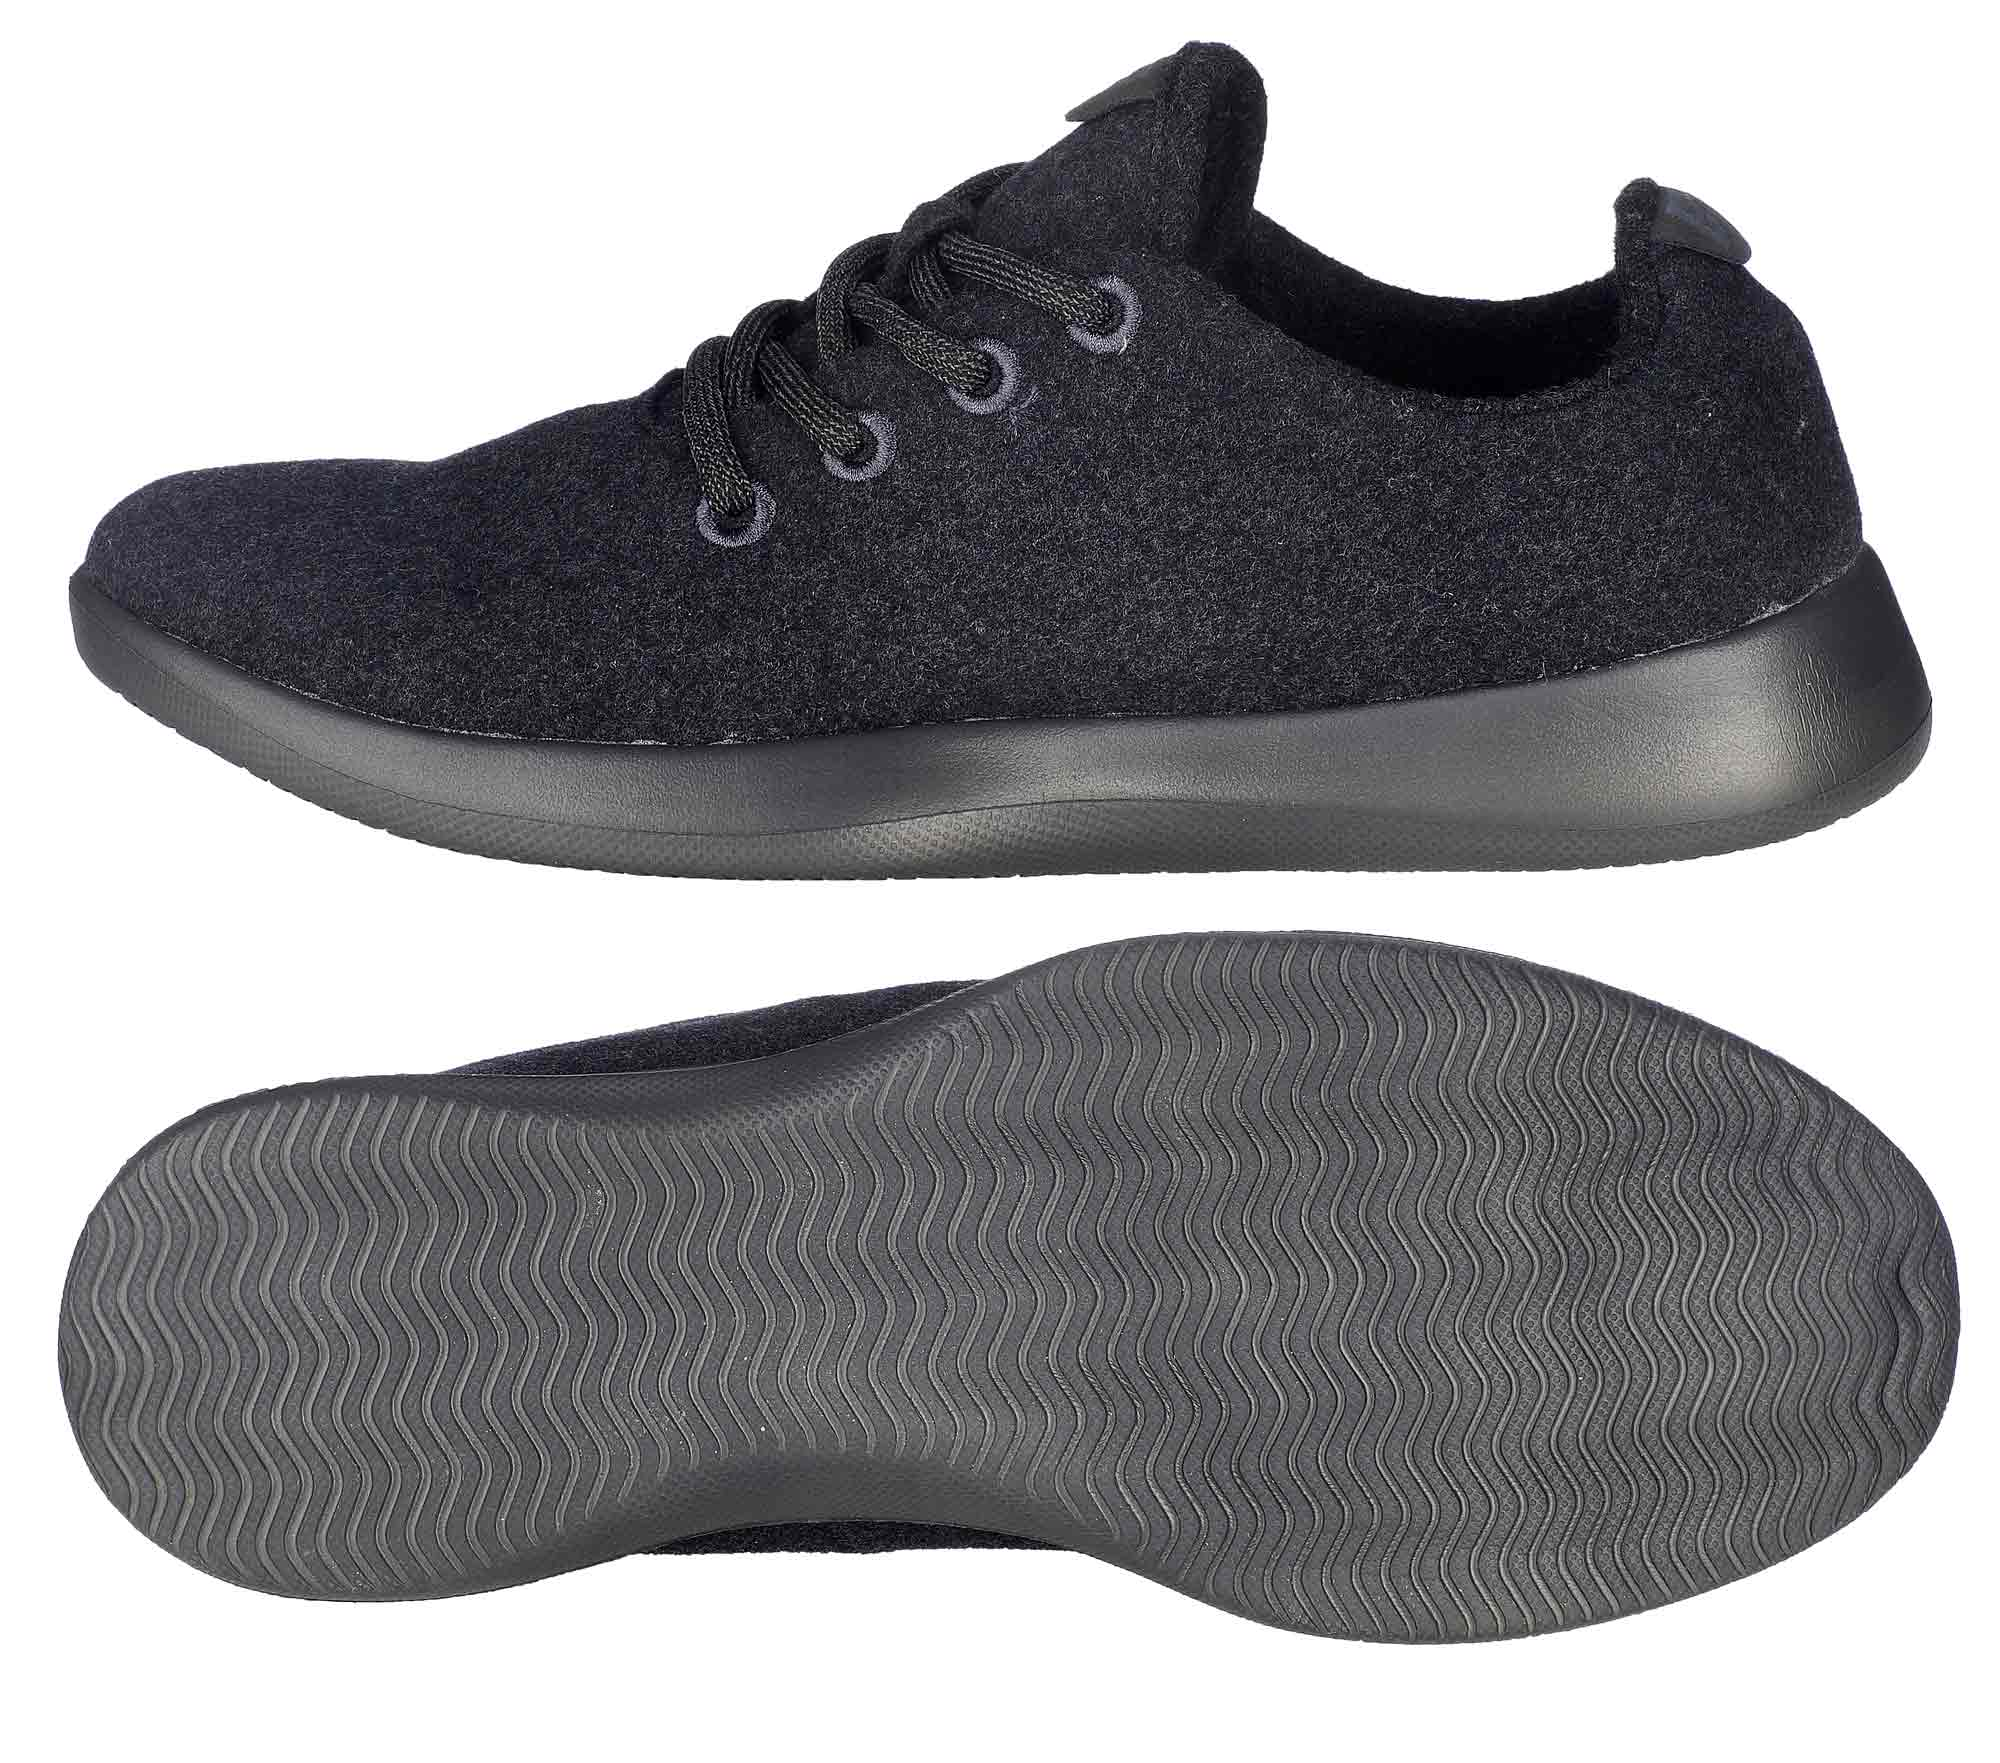 Ballop Sneaker Tenderness schwarz Wanderschuhe Wandern Sportarten Unisex